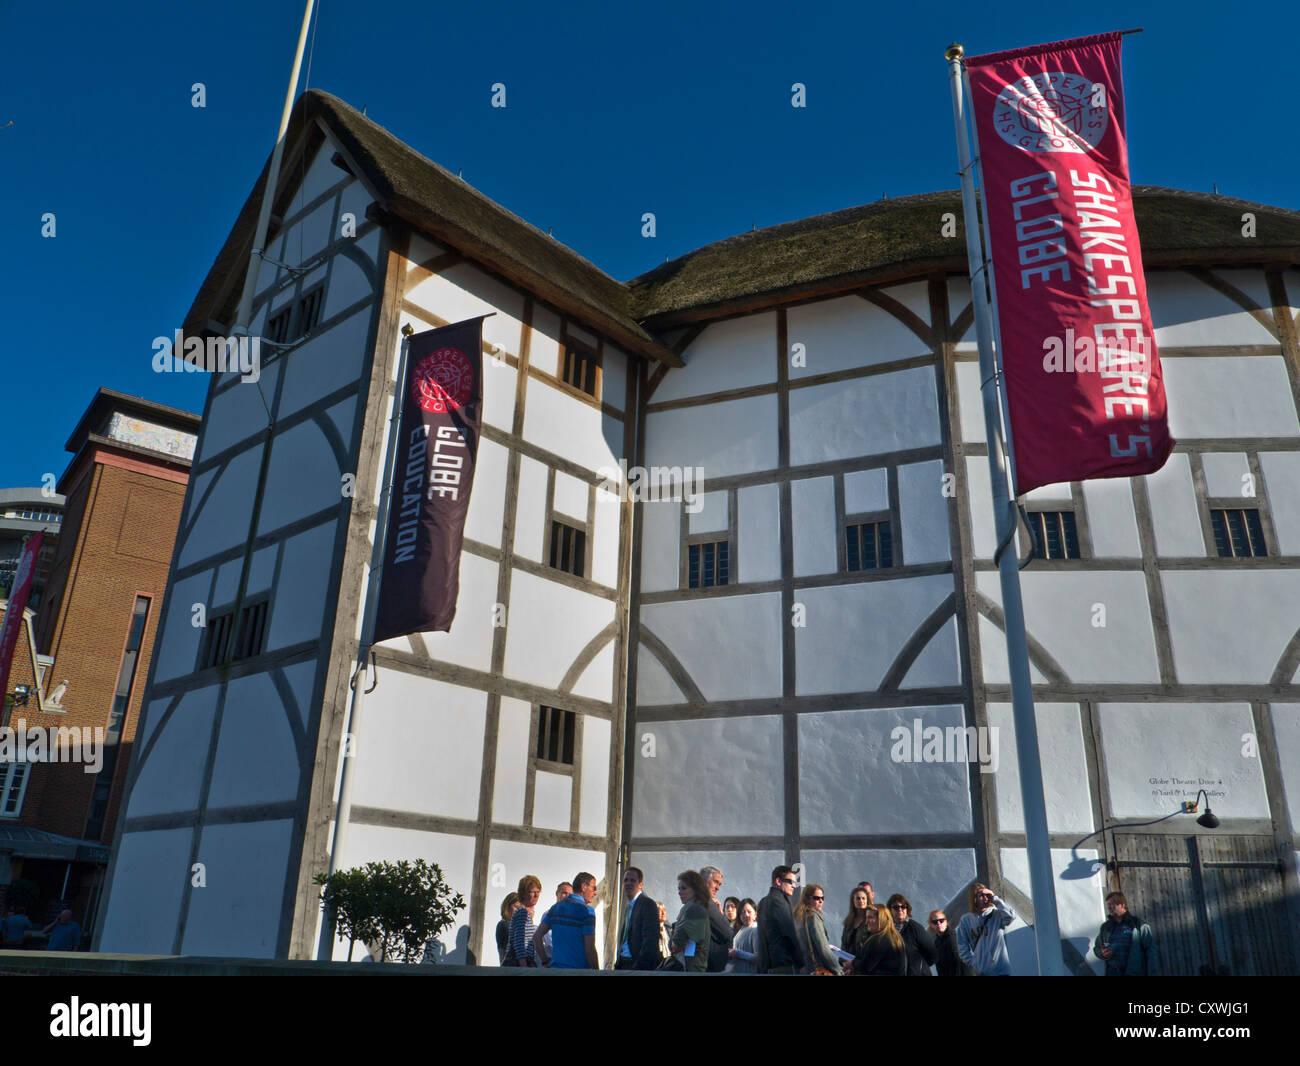 The Globe Theatre London SouthBank England UK - Stock Image